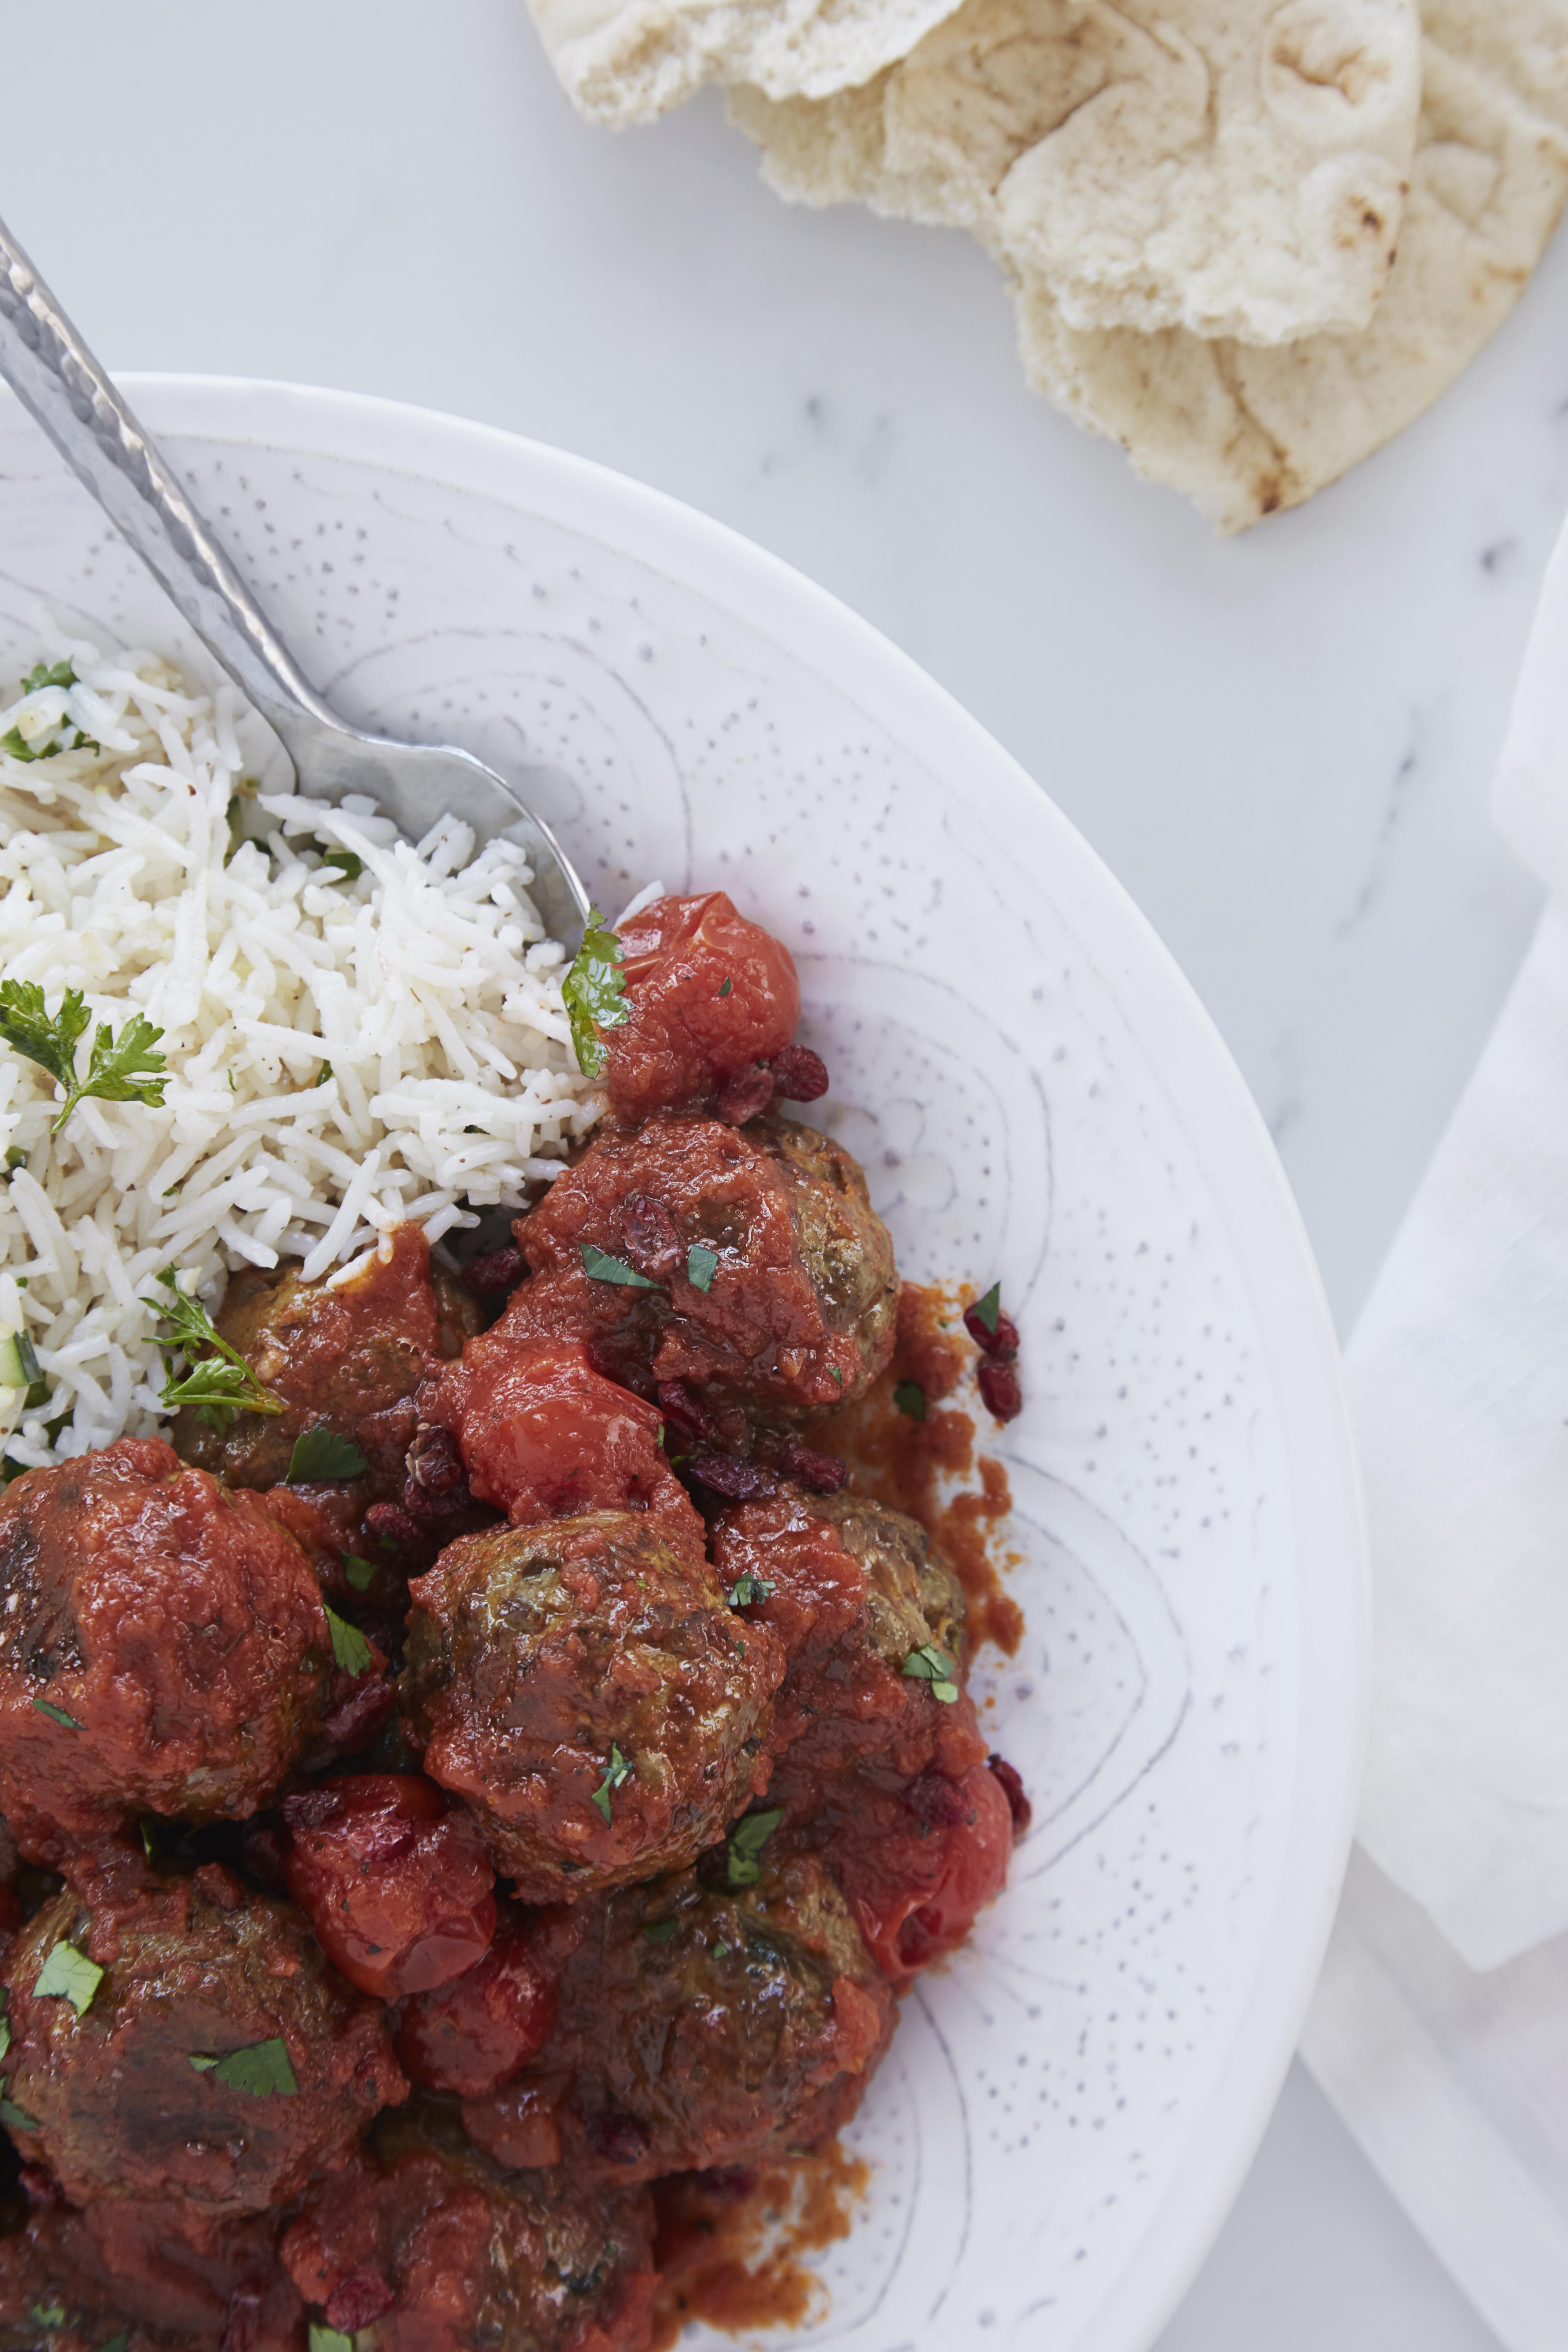 koofteh recipe how to make persian meatballs